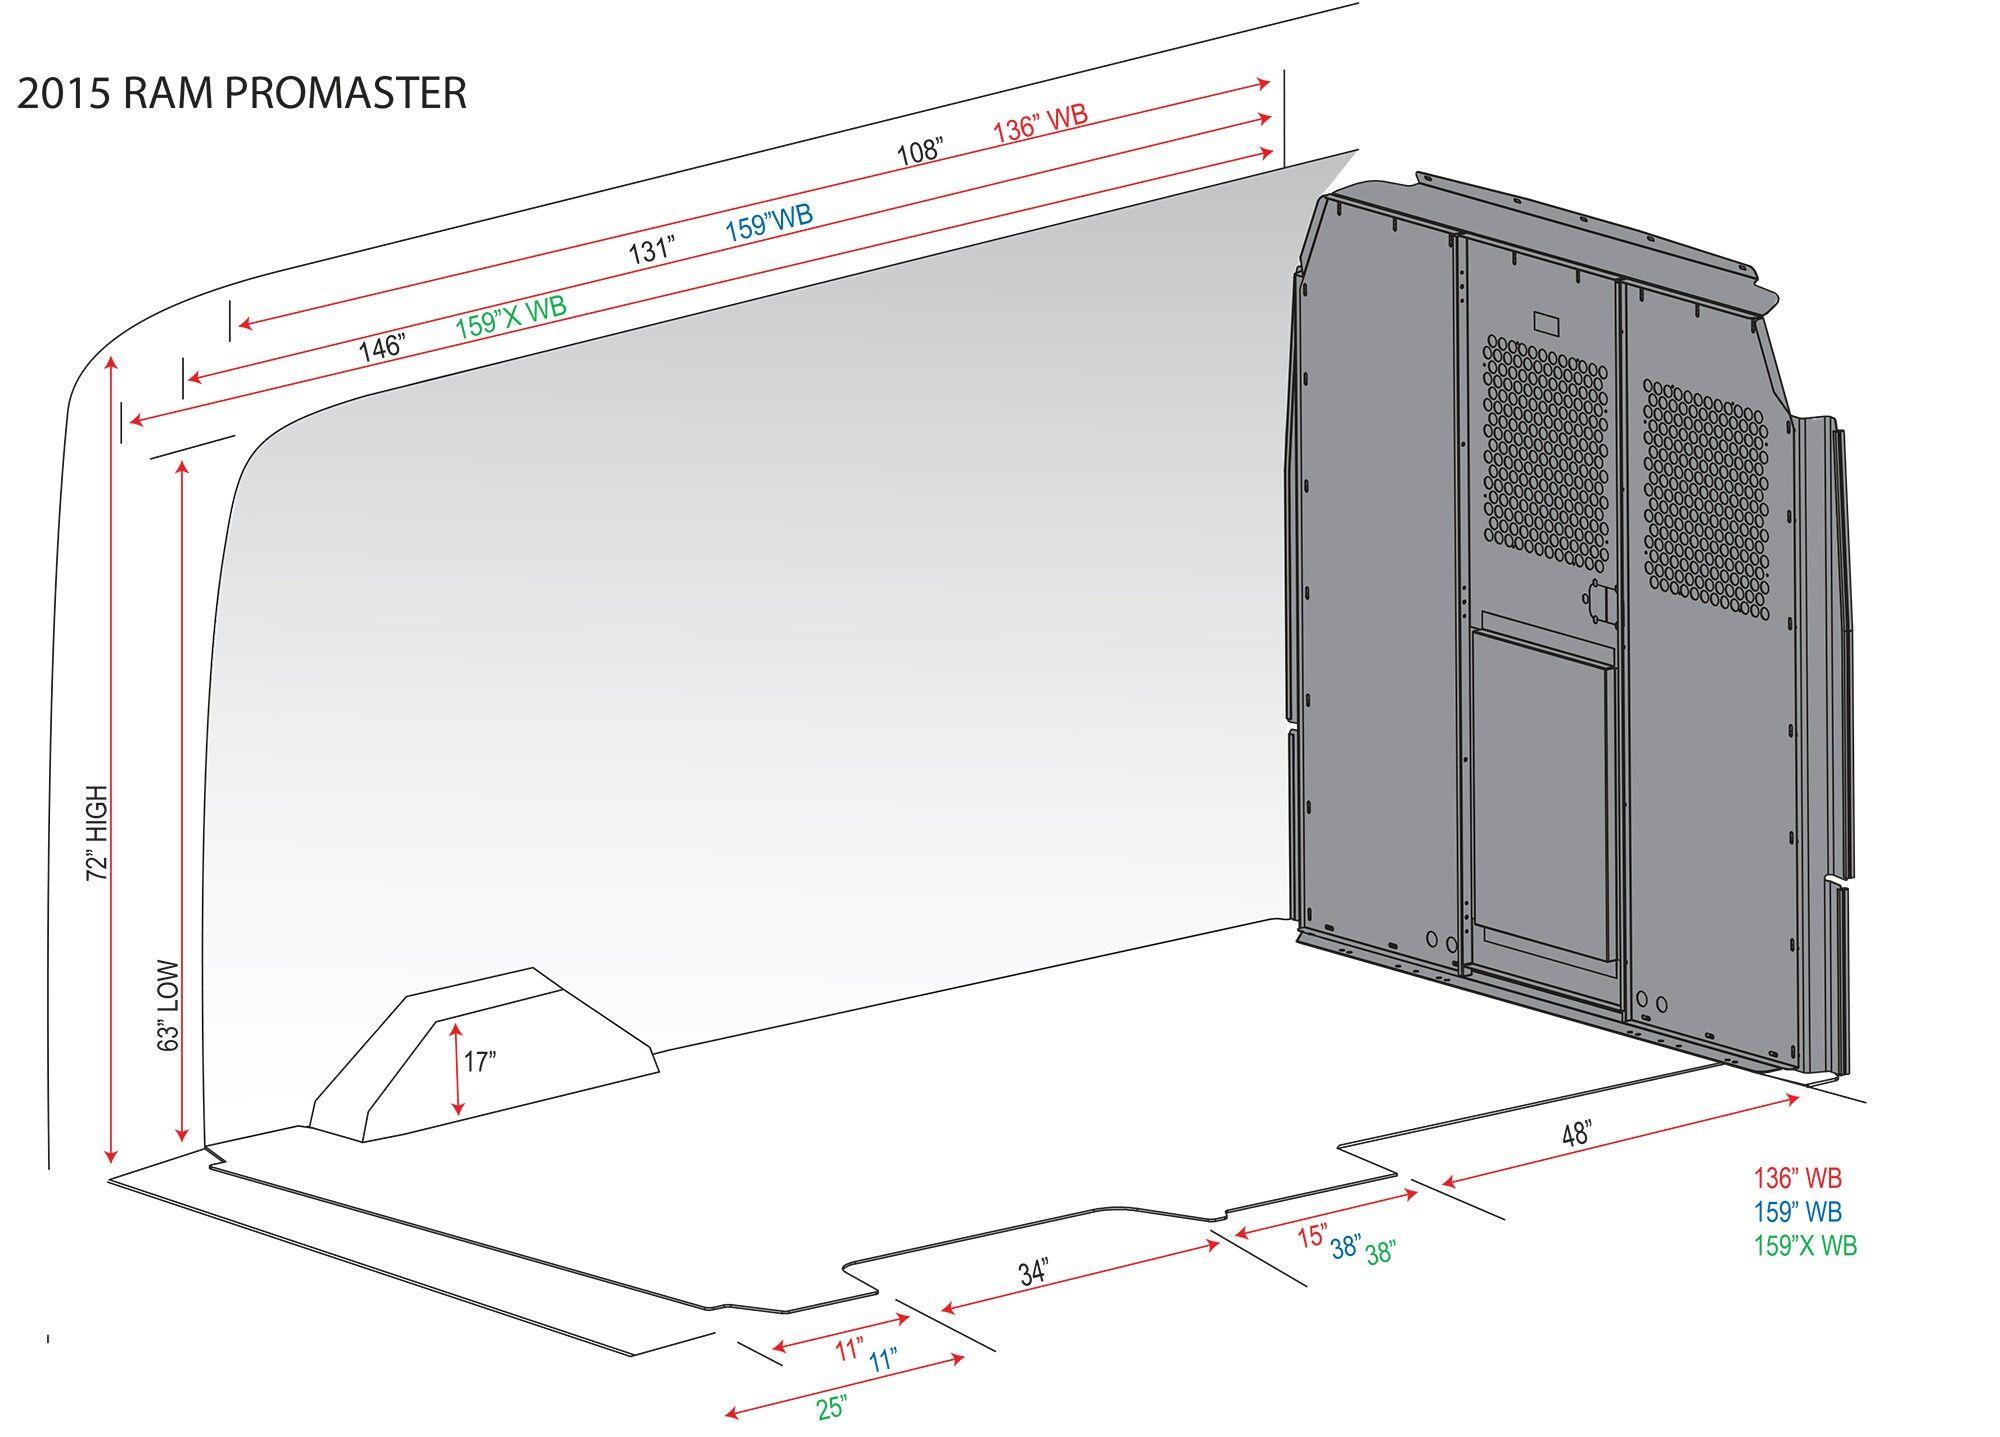 Dodge promaster measurements Ram promaster, Van